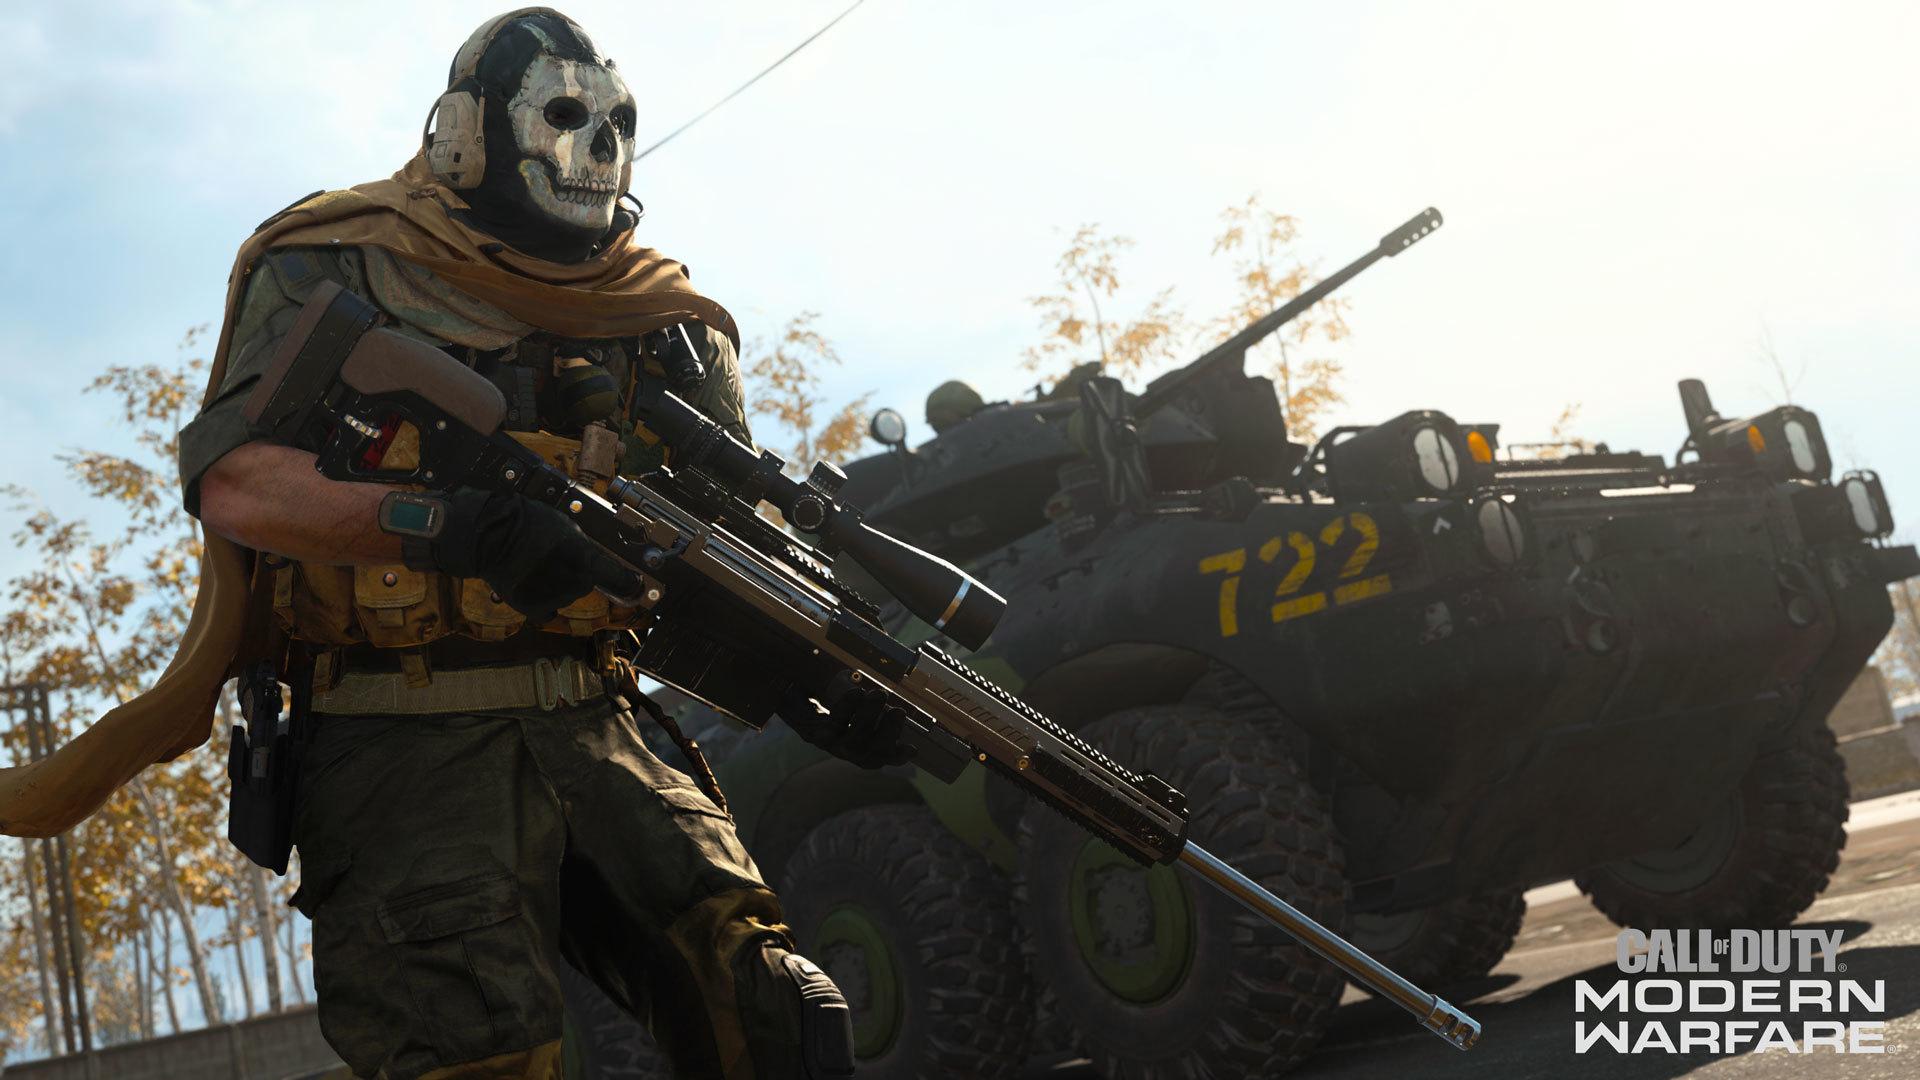 Call Of Duty Modern Warfare Brings Back Ghost Teases Battle